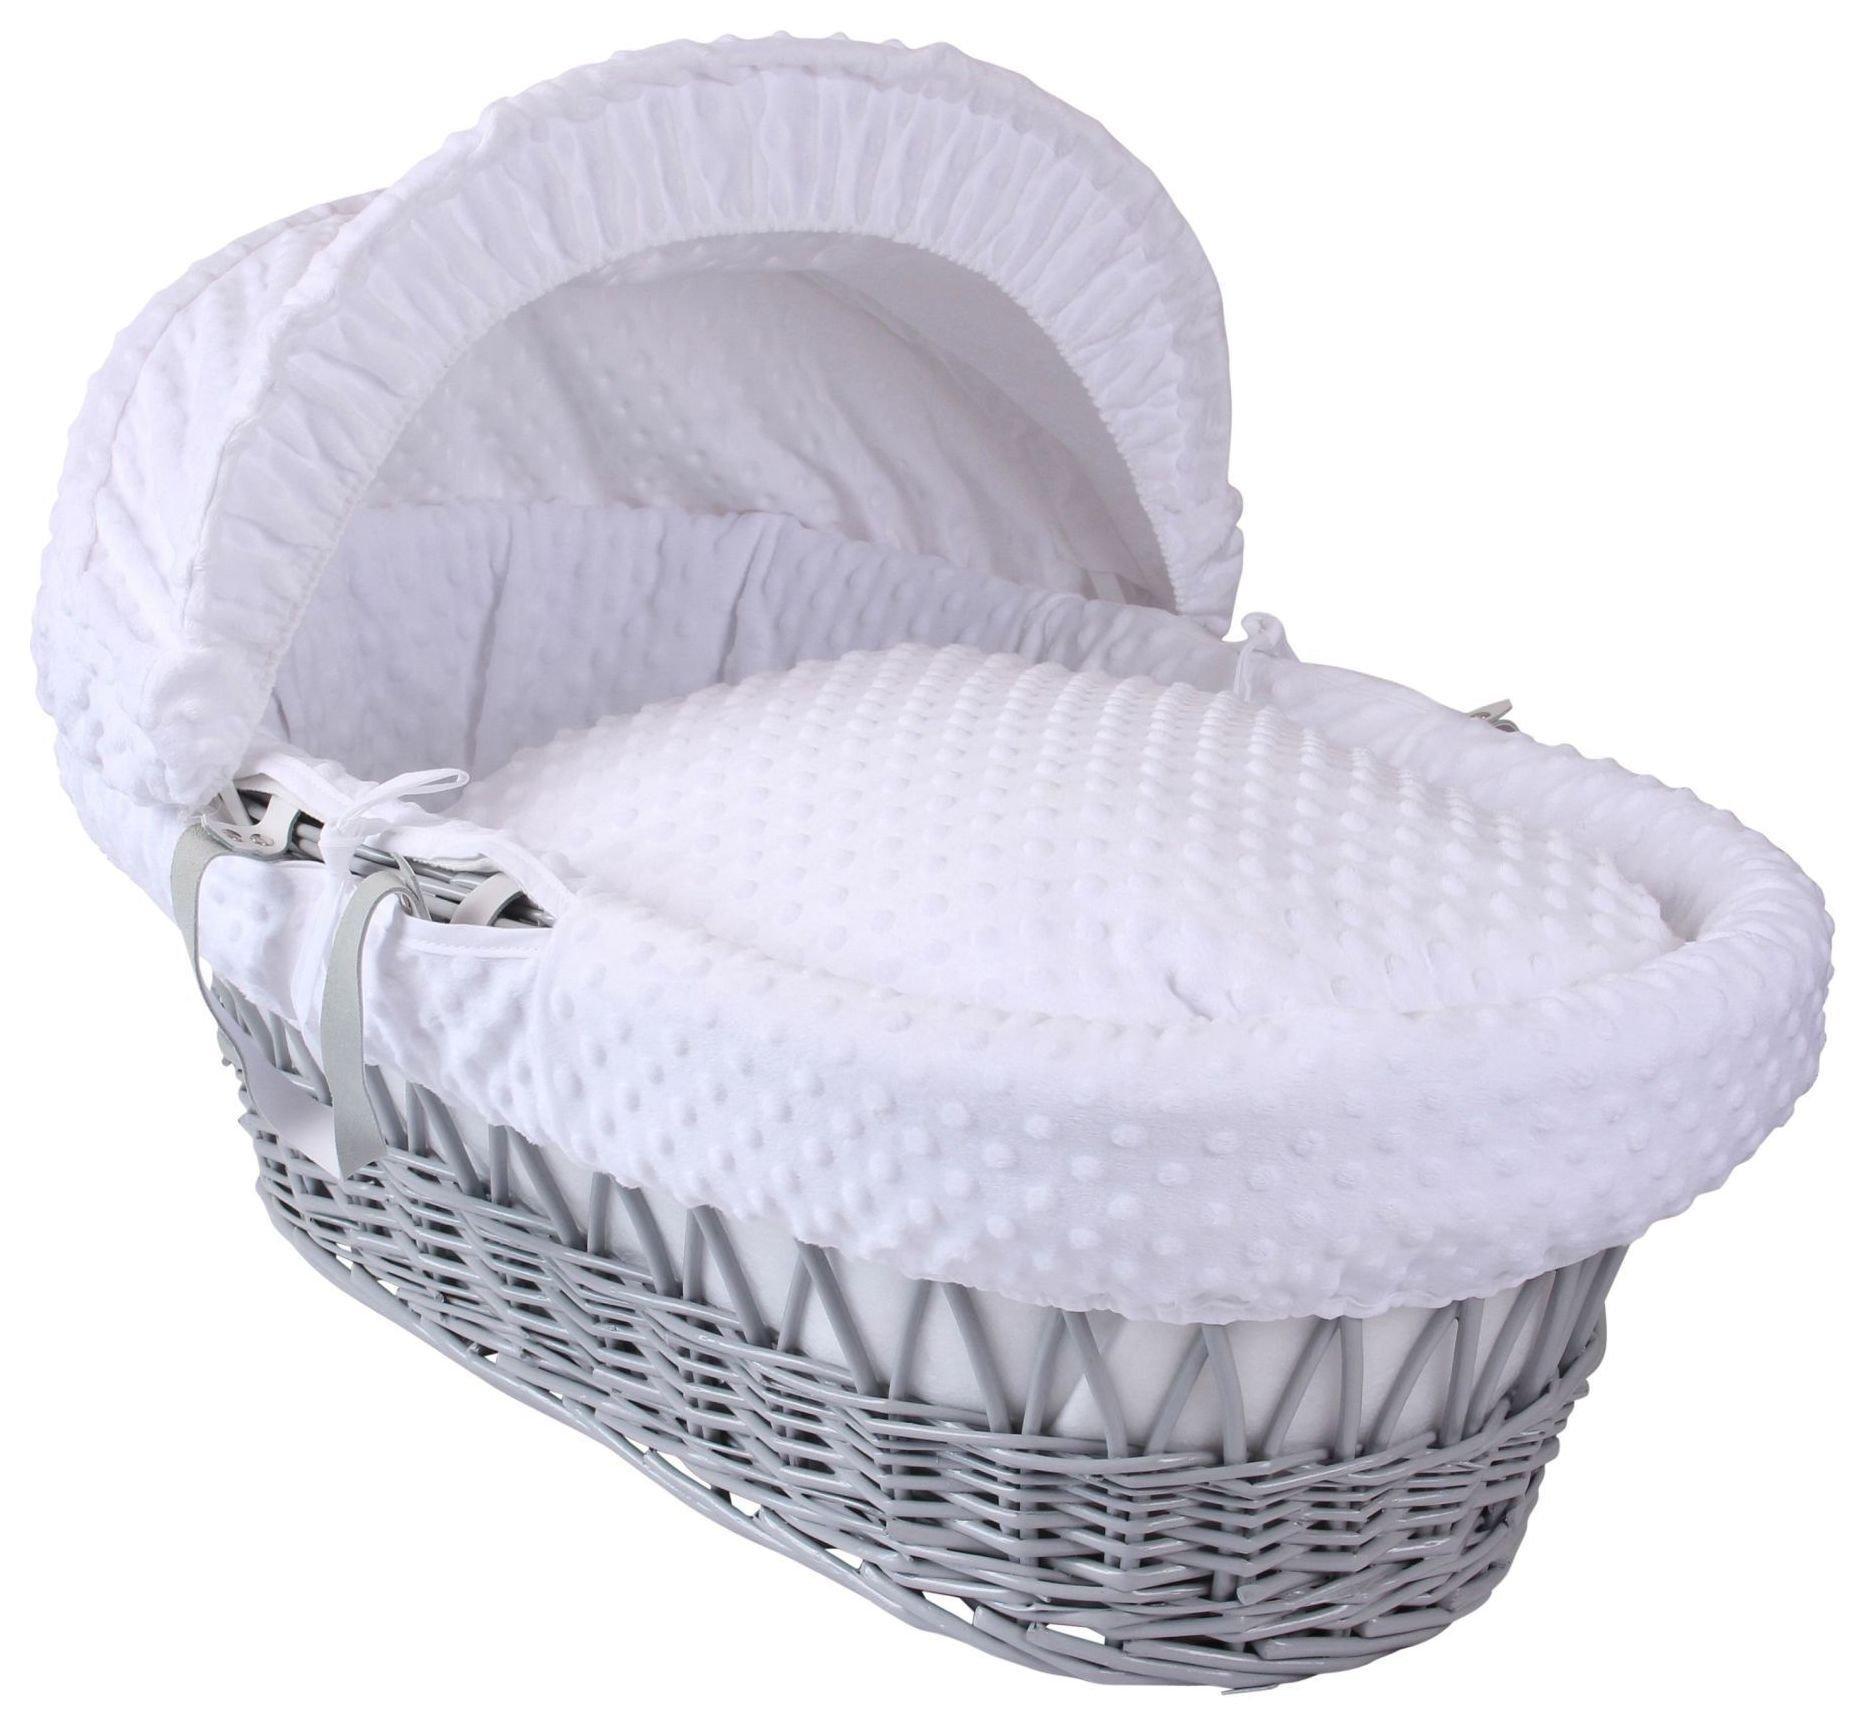 Clair de Lune Dimple Wicker Basket - White/Grey